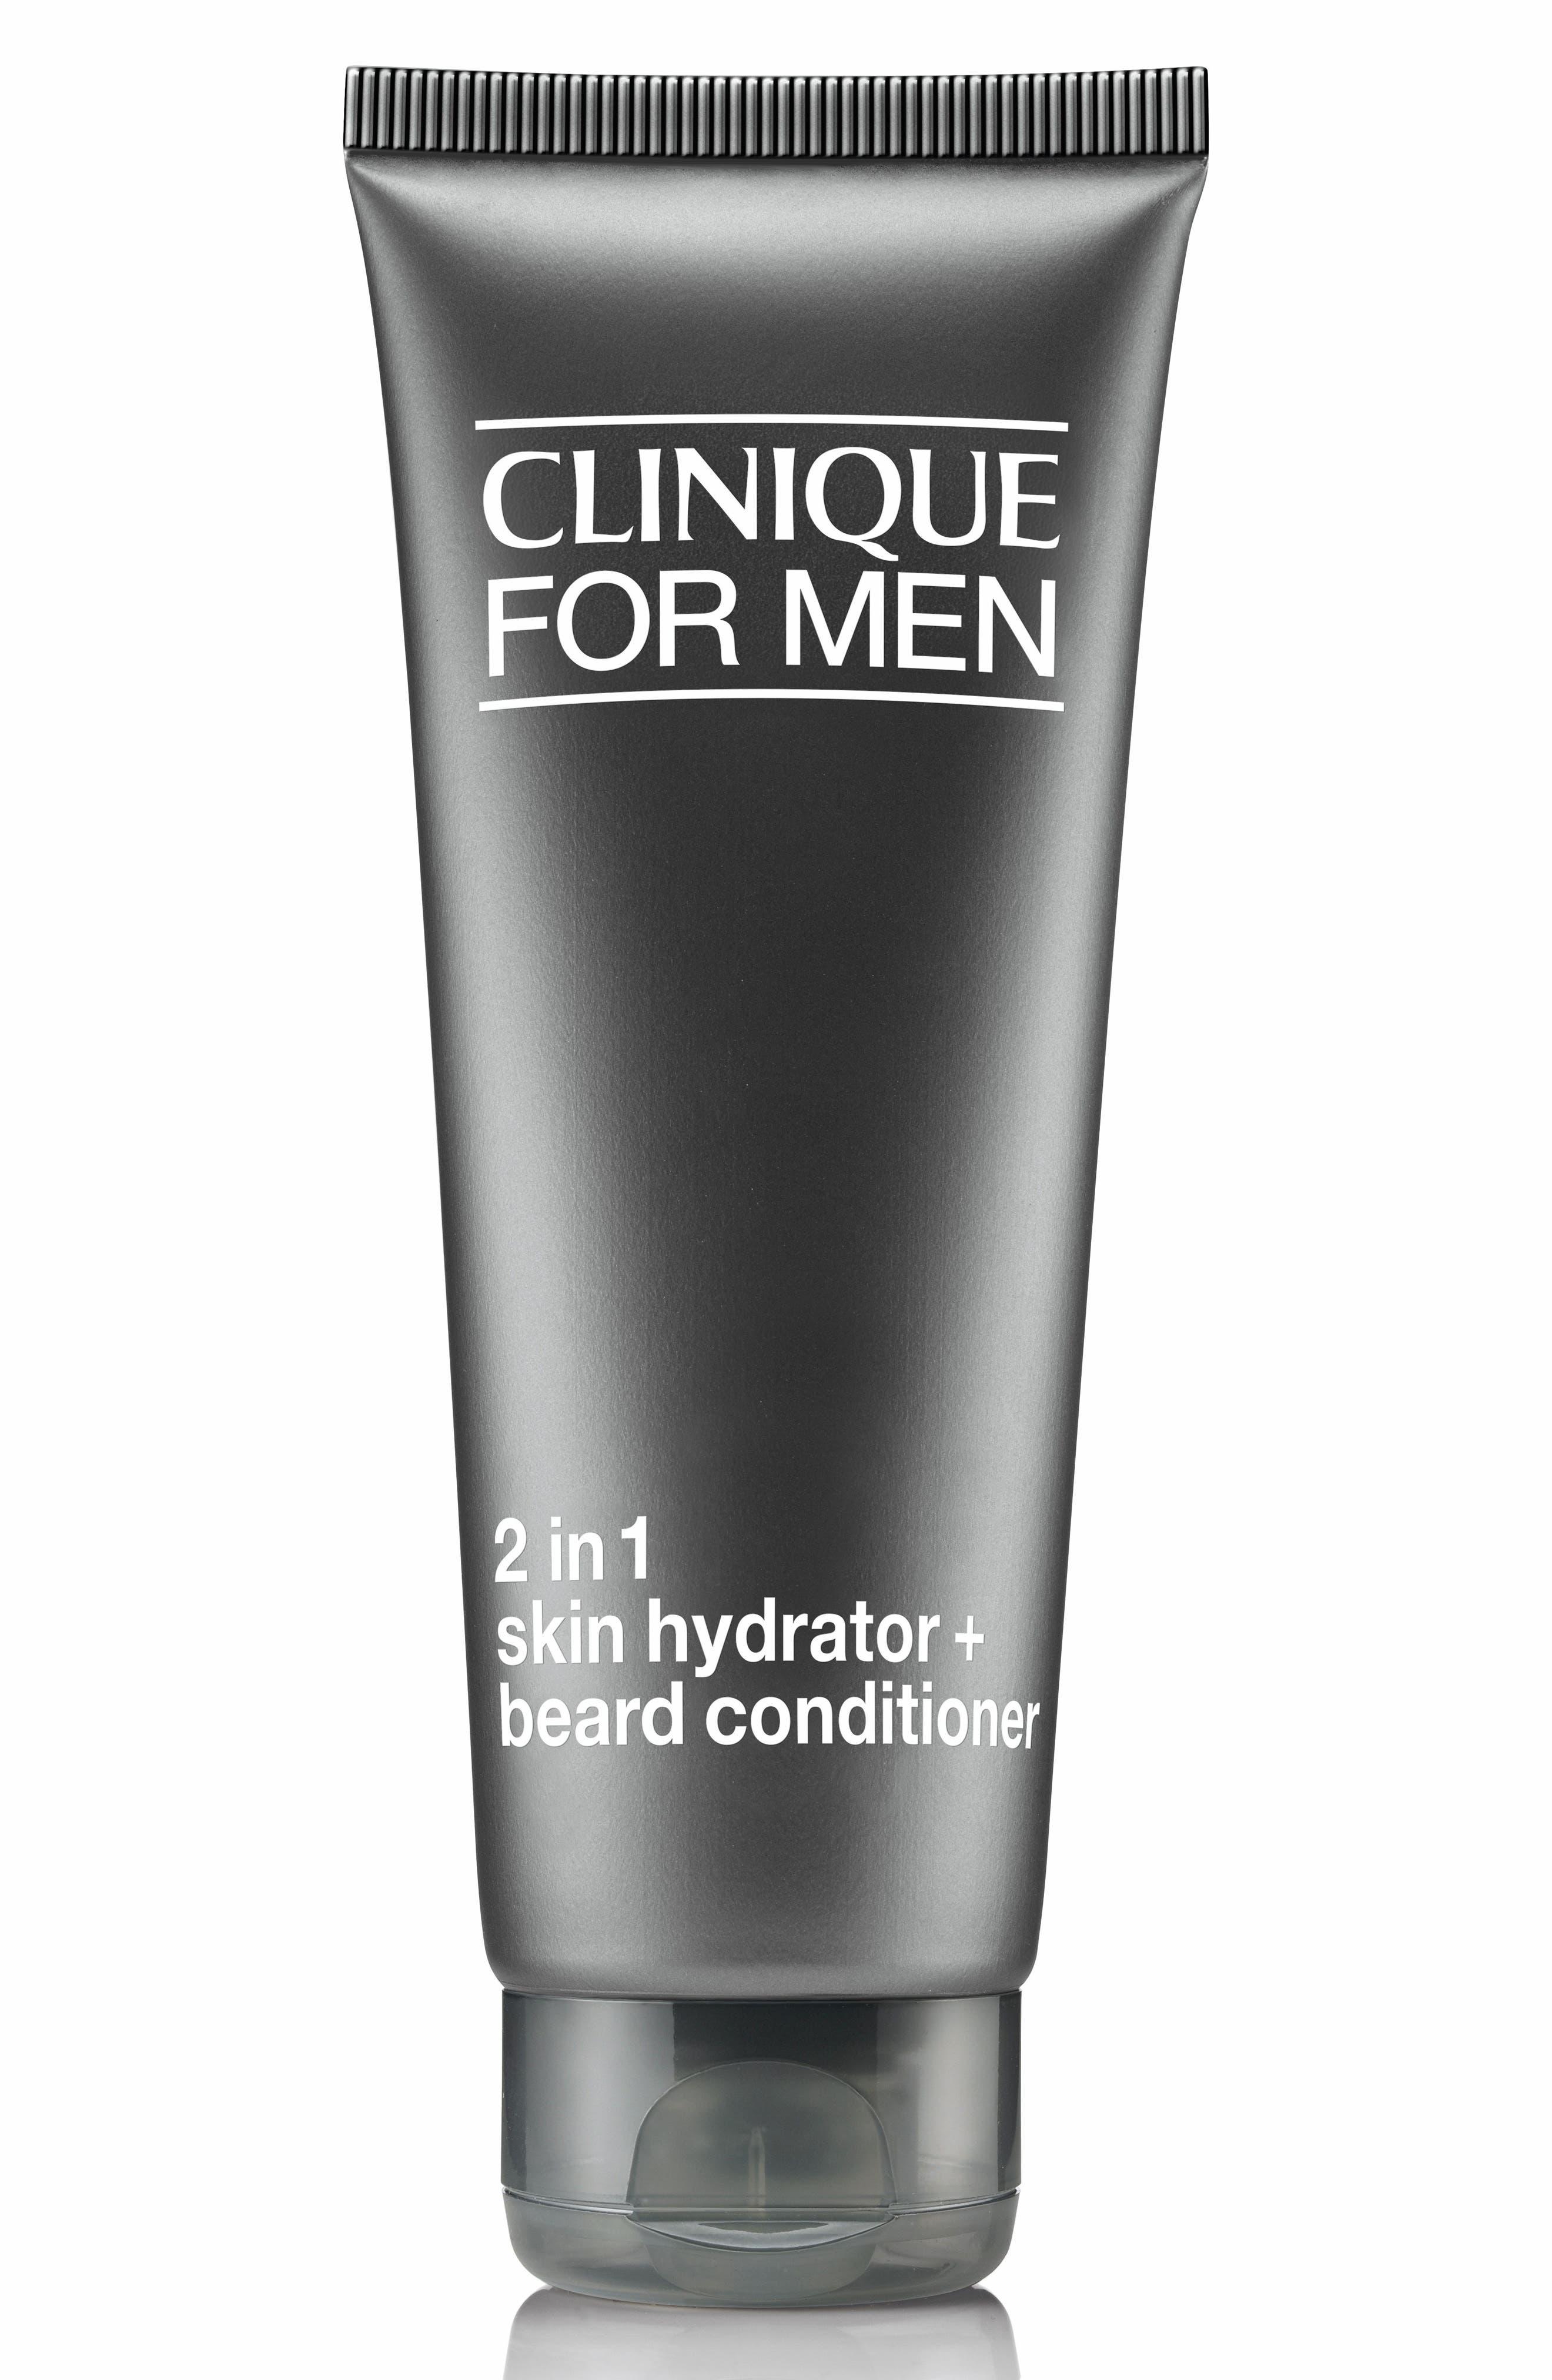 CLINIQUE for Men 2-in-1 Skin Hydrator + Beard Conditioner Lotion, Main, color, NO COLOR